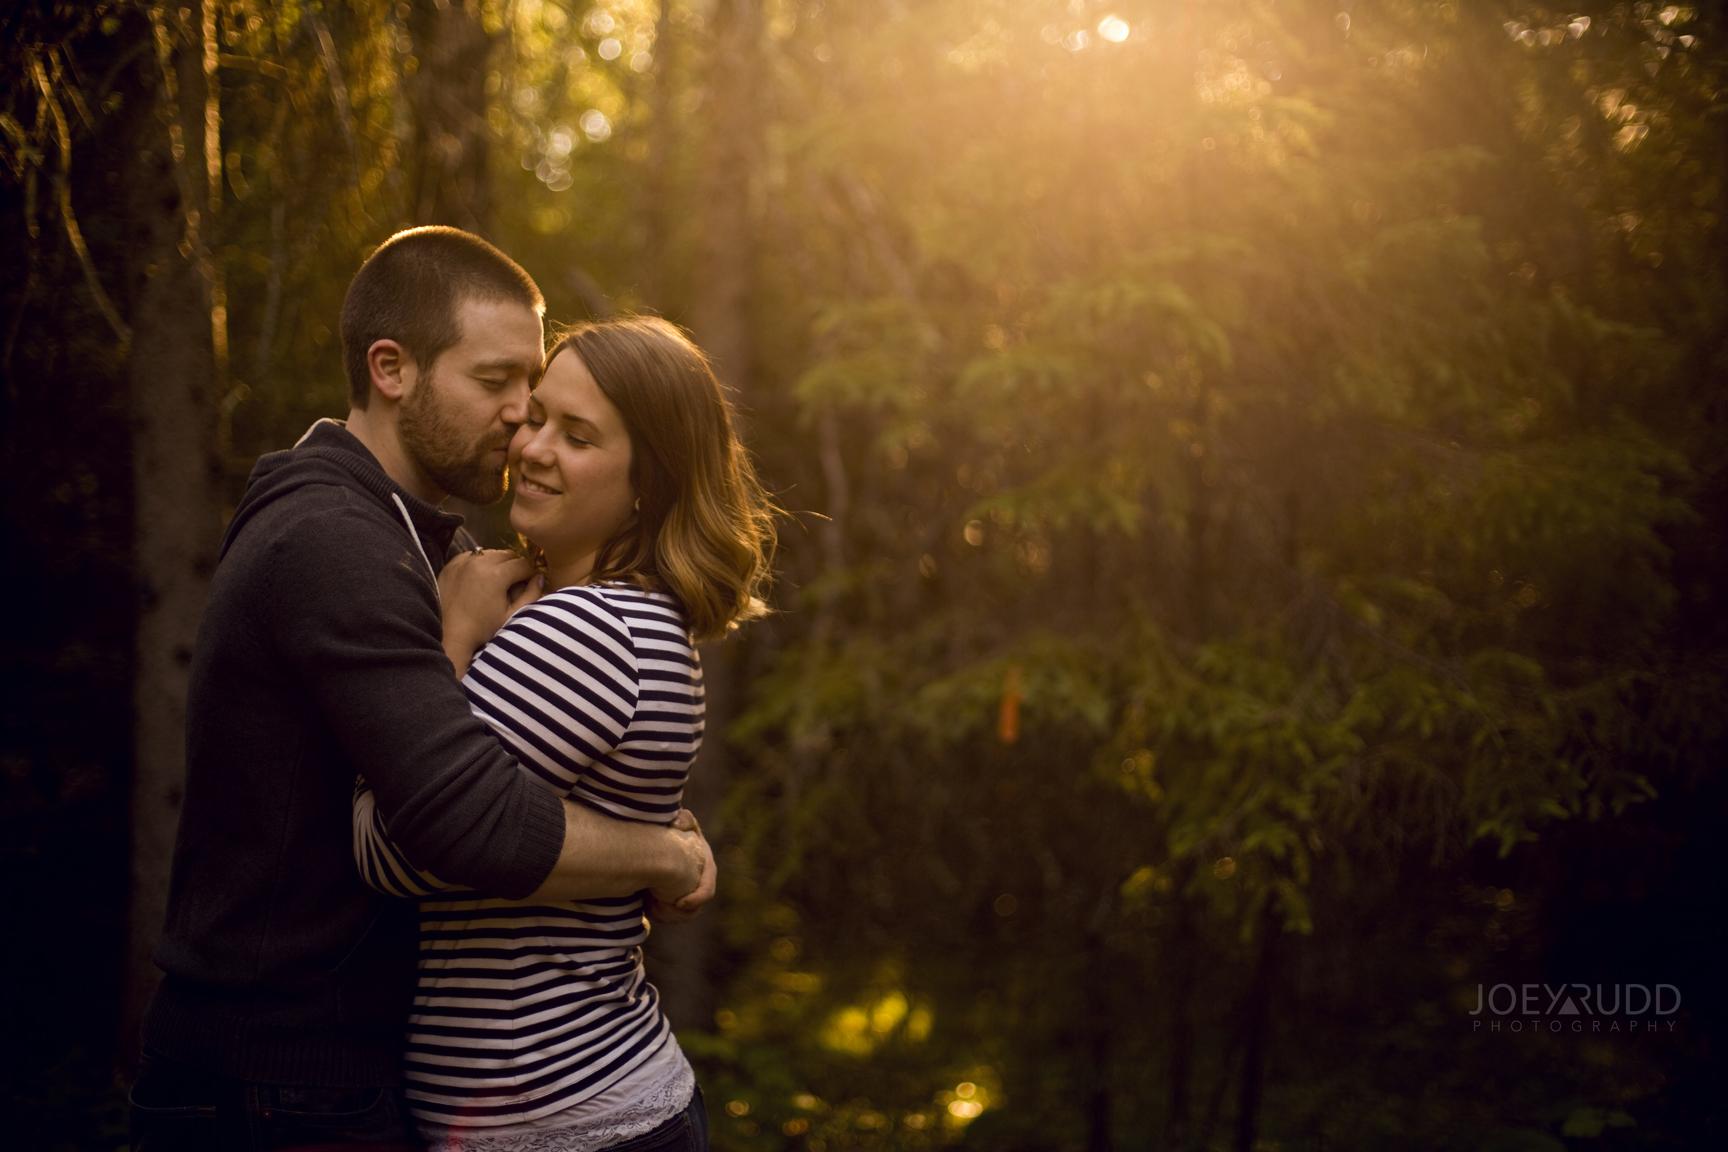 Rustic Engagement by Ottawa Wedding Photographer Joey Rudd Photography Romantic